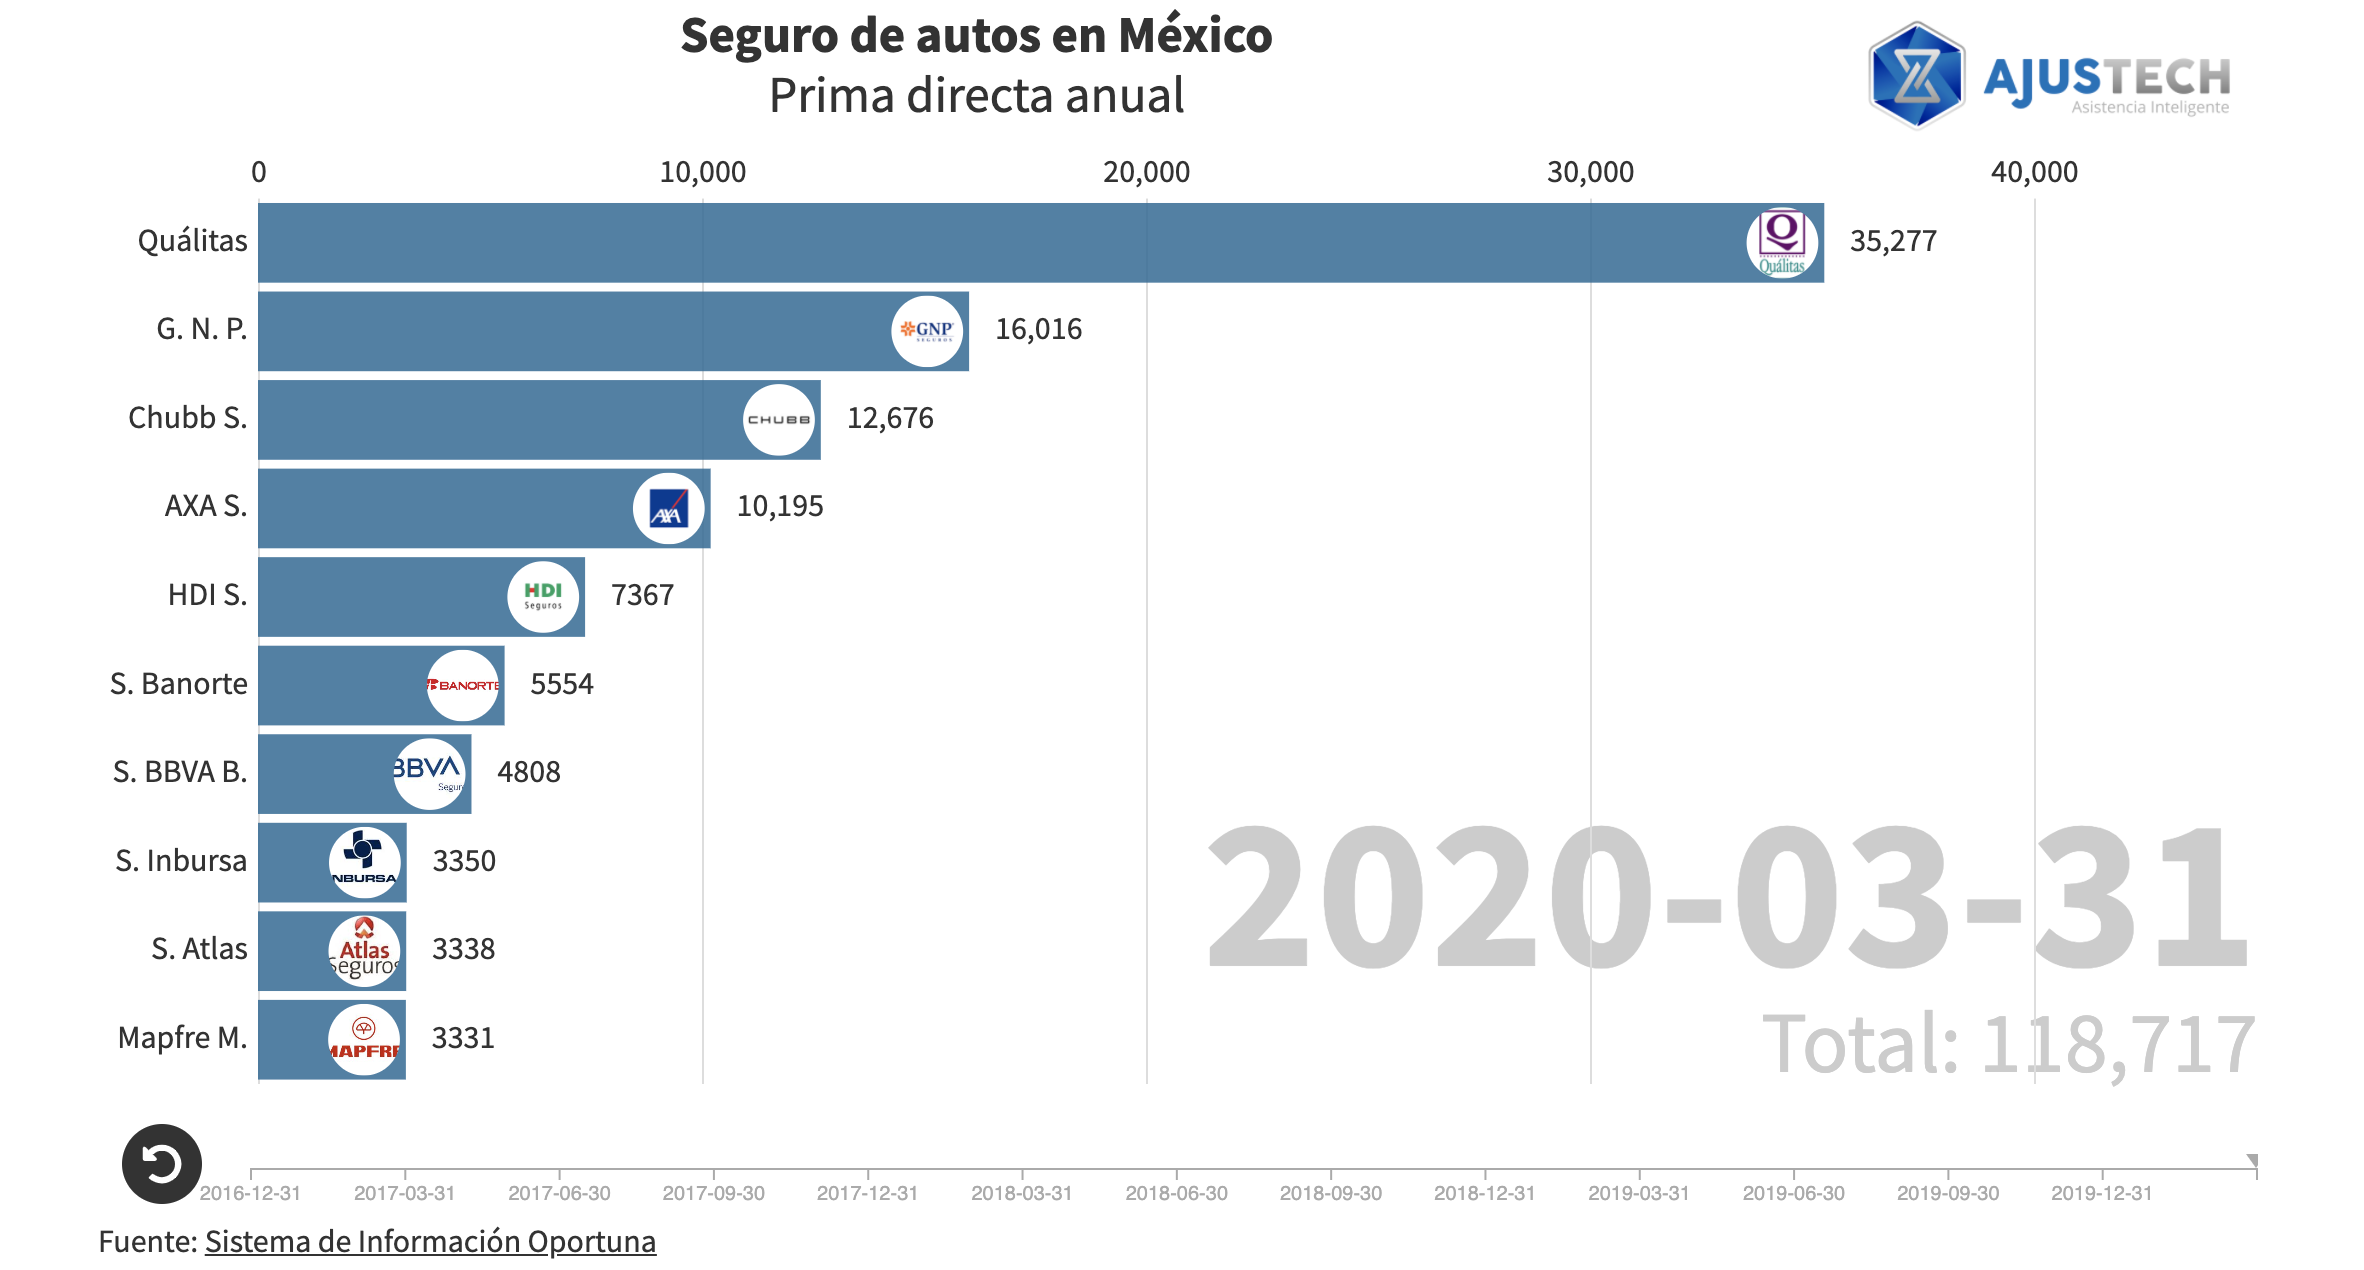 Evolución del seguro de autos en México